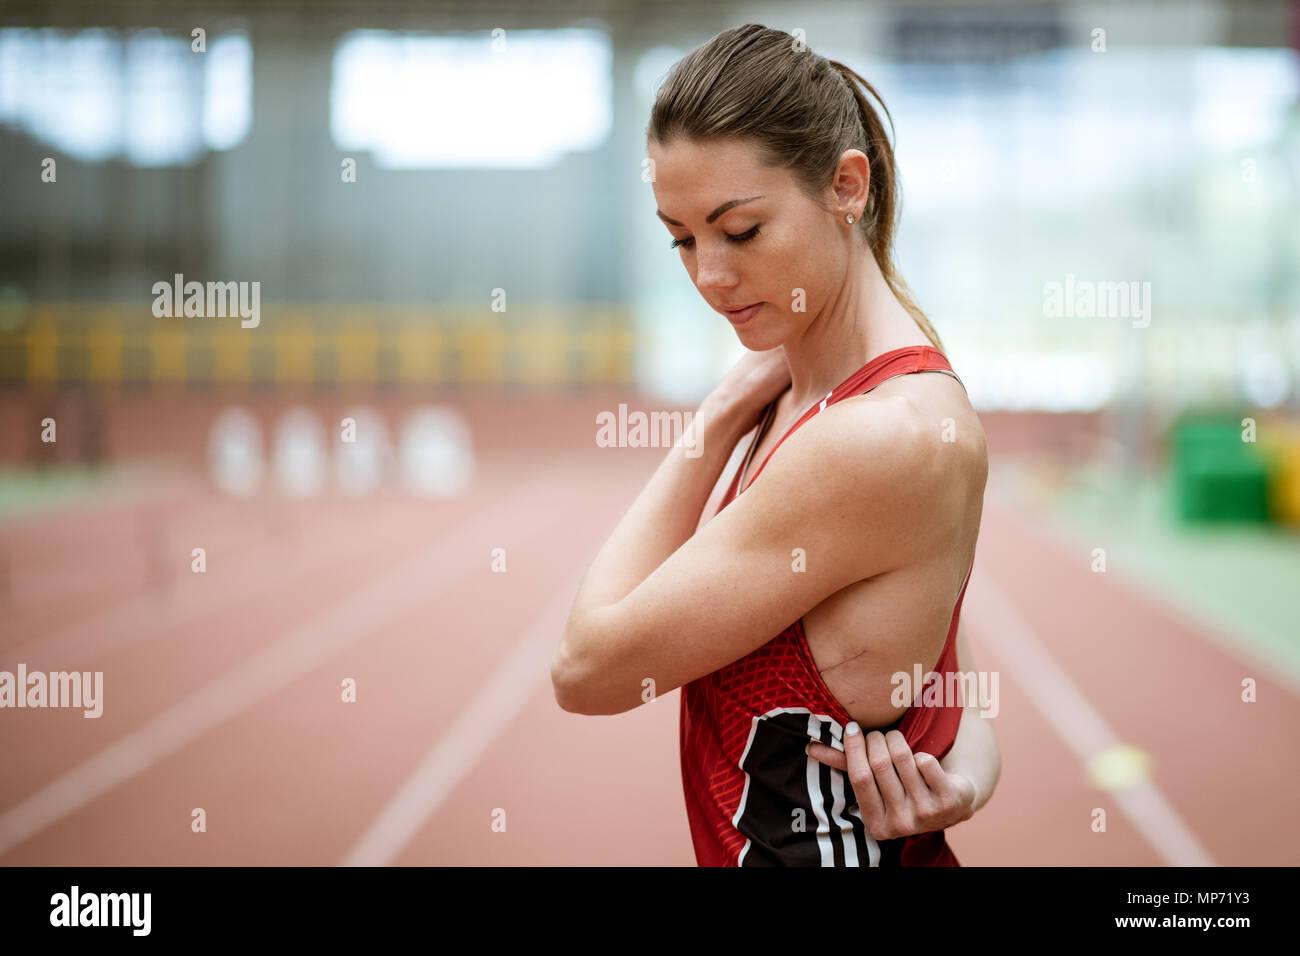 11 May 2018, Germany, Leverkusen: Pole-jumper Katharina Bauer of TSV Bayer 04 Leverkusen shows her operation scar. Photo: Marius Becker/dpa - Stock Image